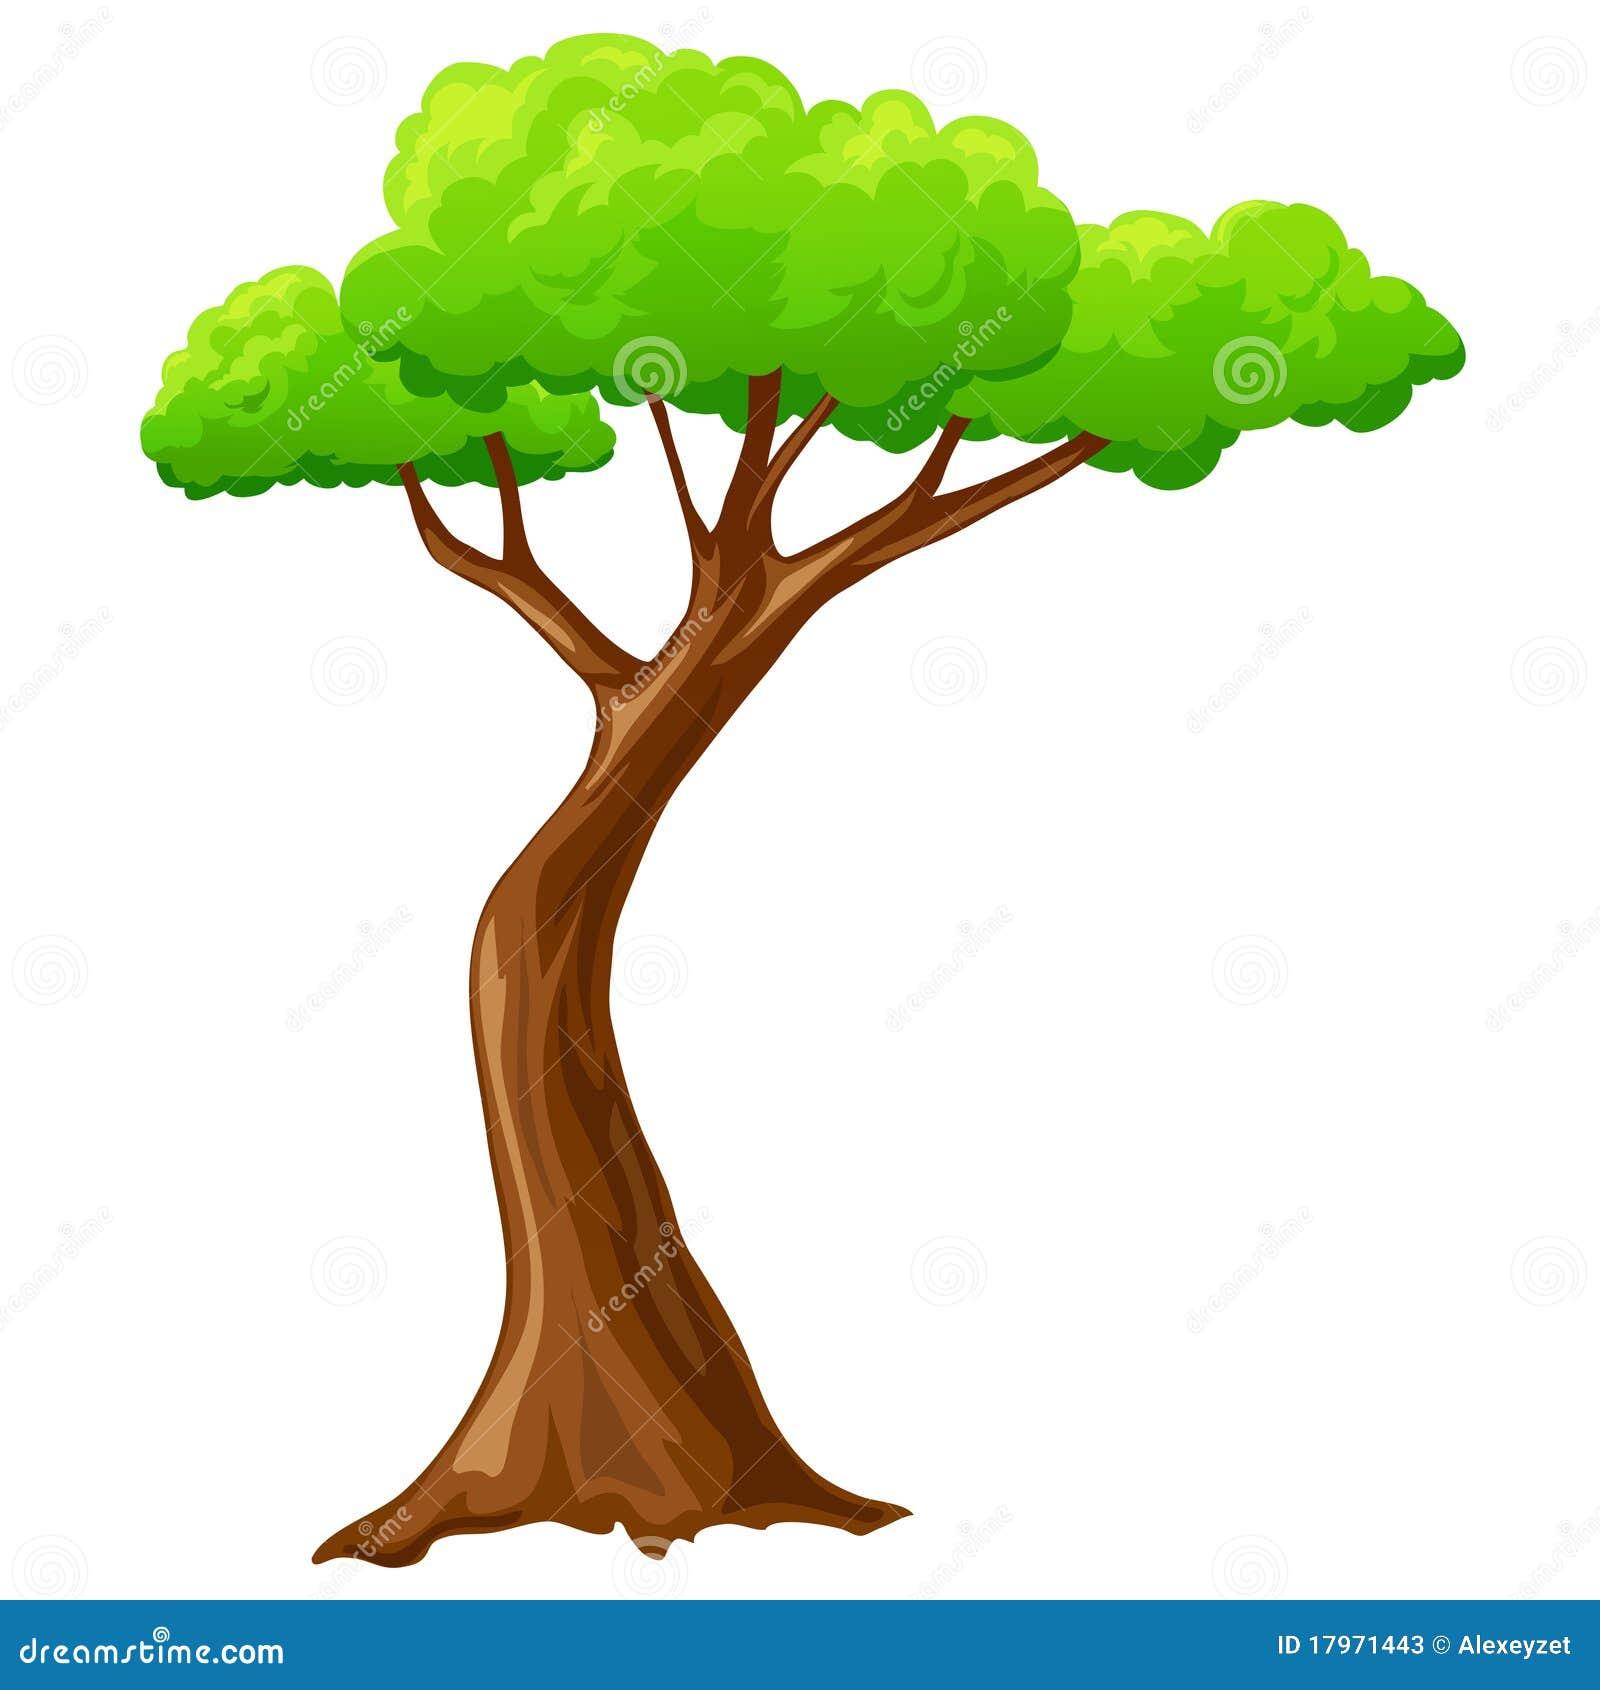 Cartoon Isolated Tree On White Background Stock Vector ...